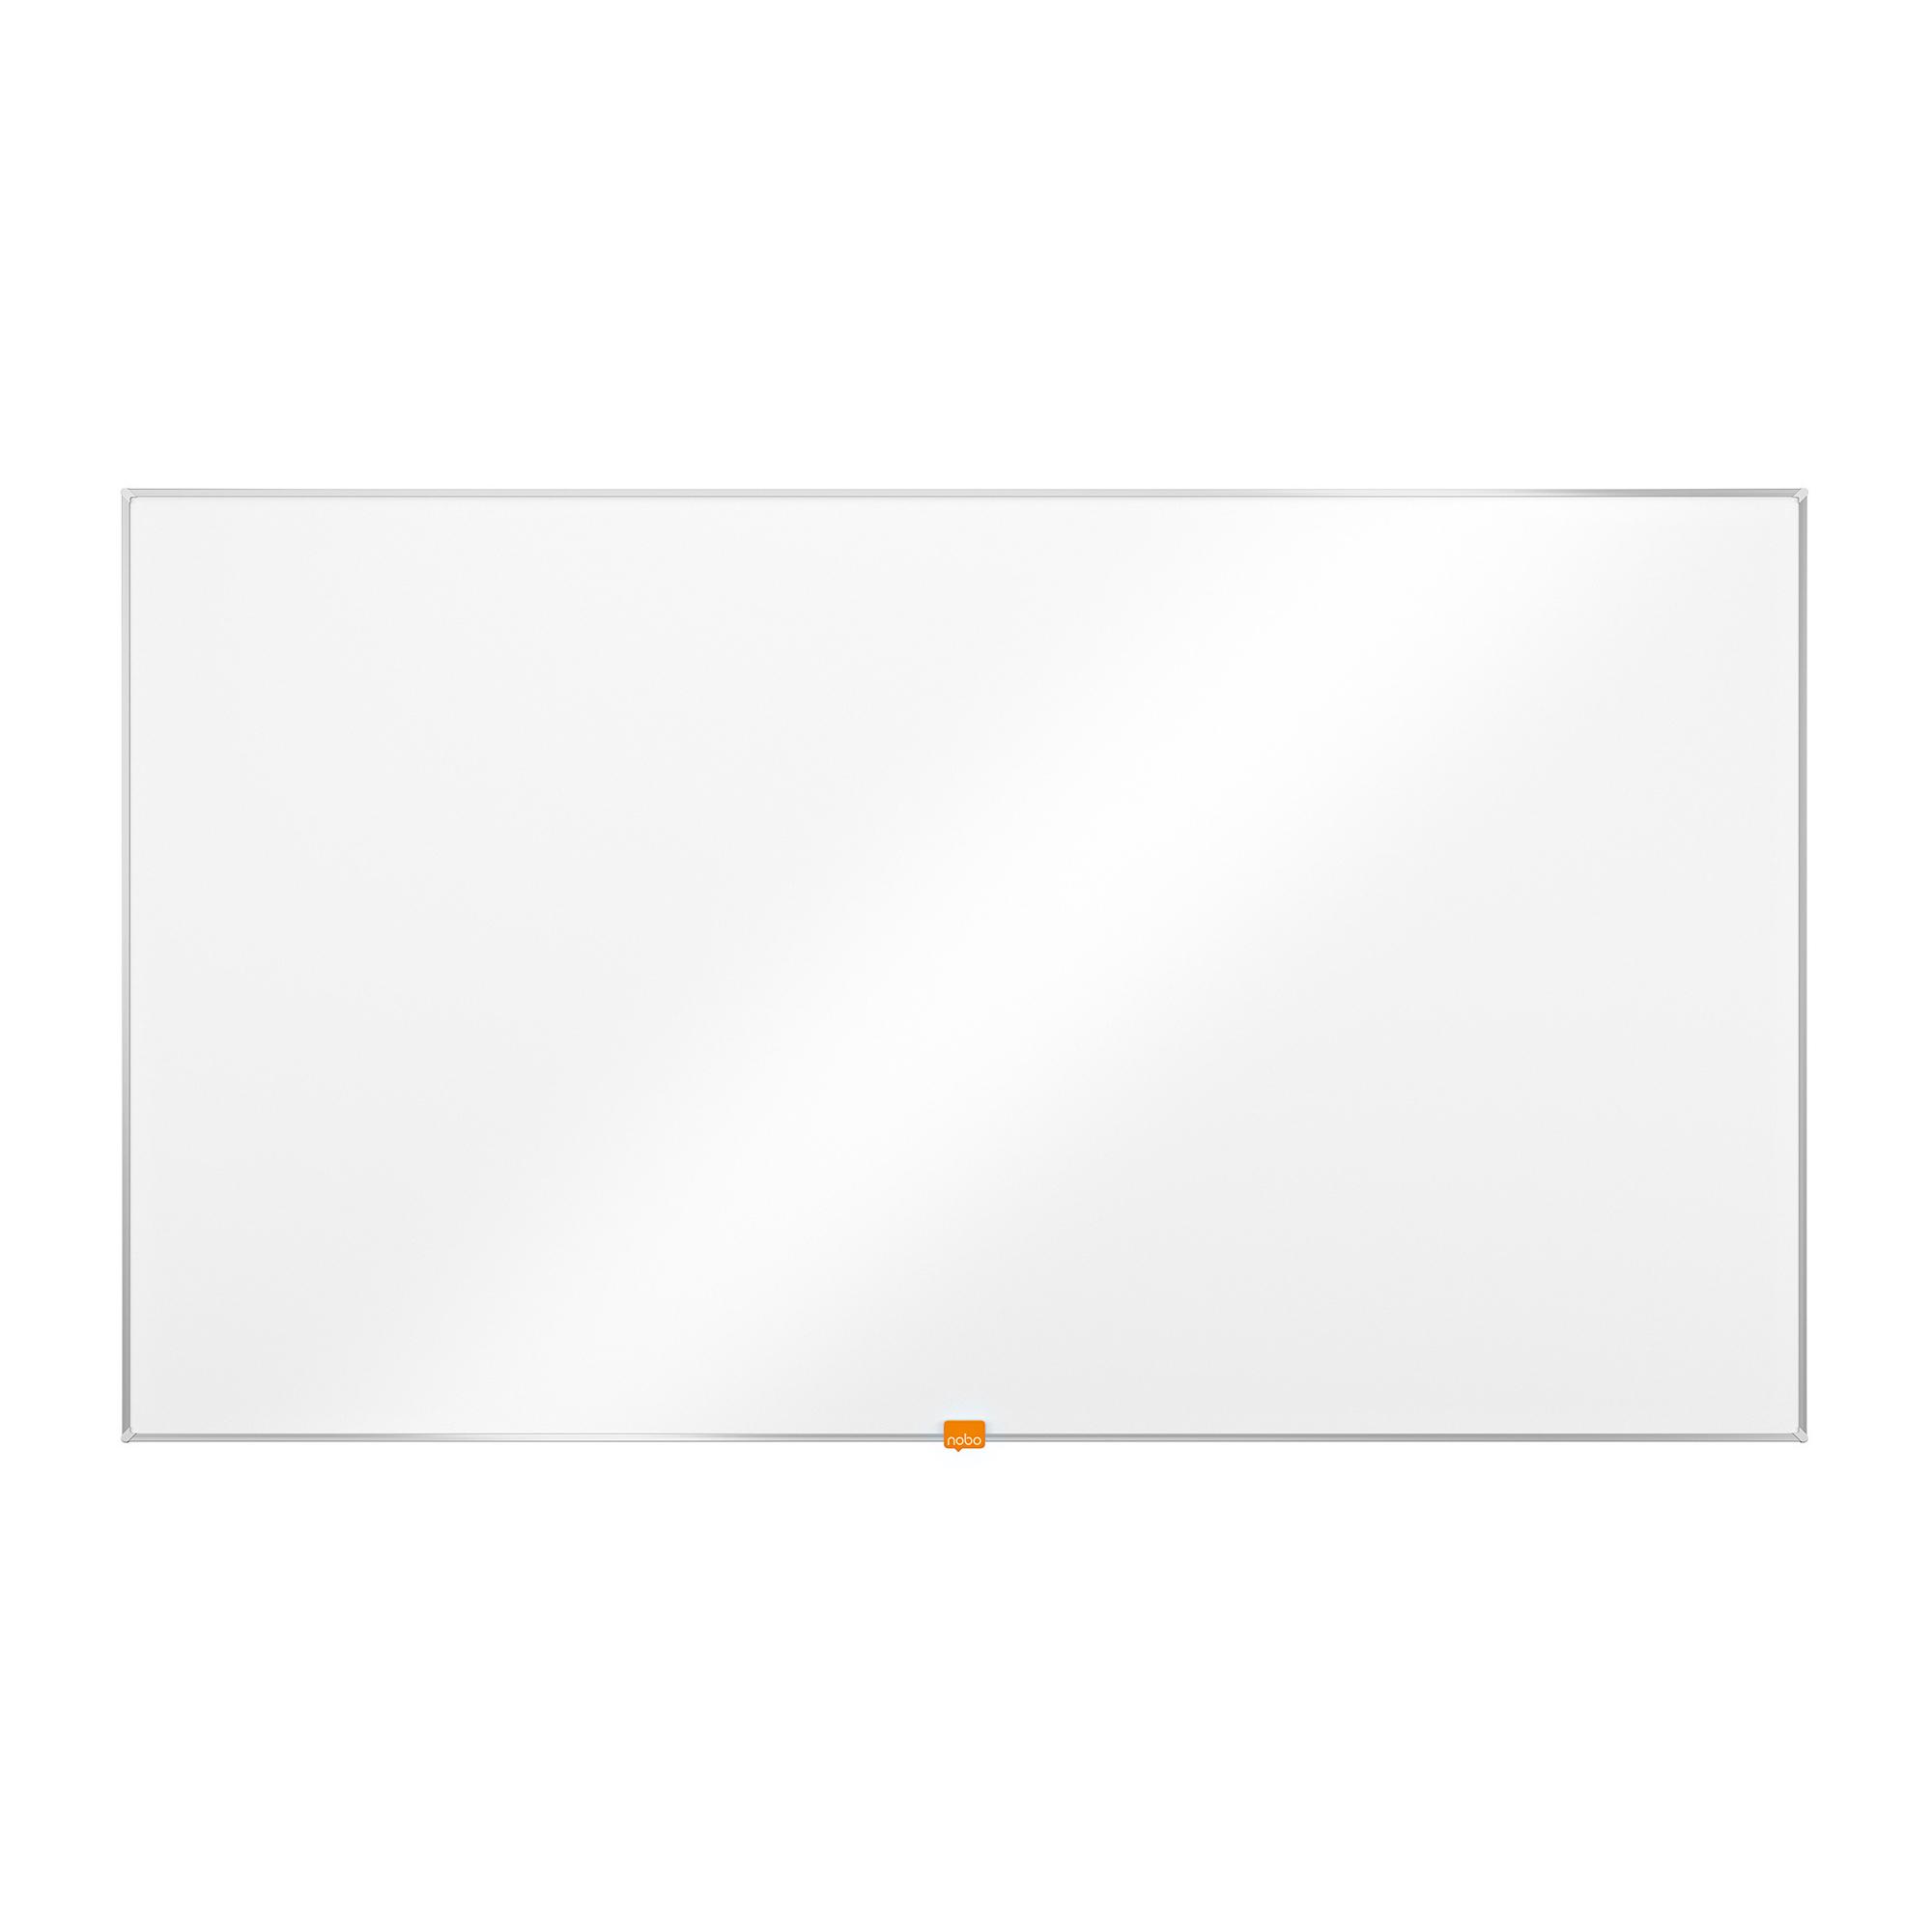 Nobo Whiteboard Widescreen 55 Inch Nano Clean Magnetic W1229xH698 White Ref 1905298